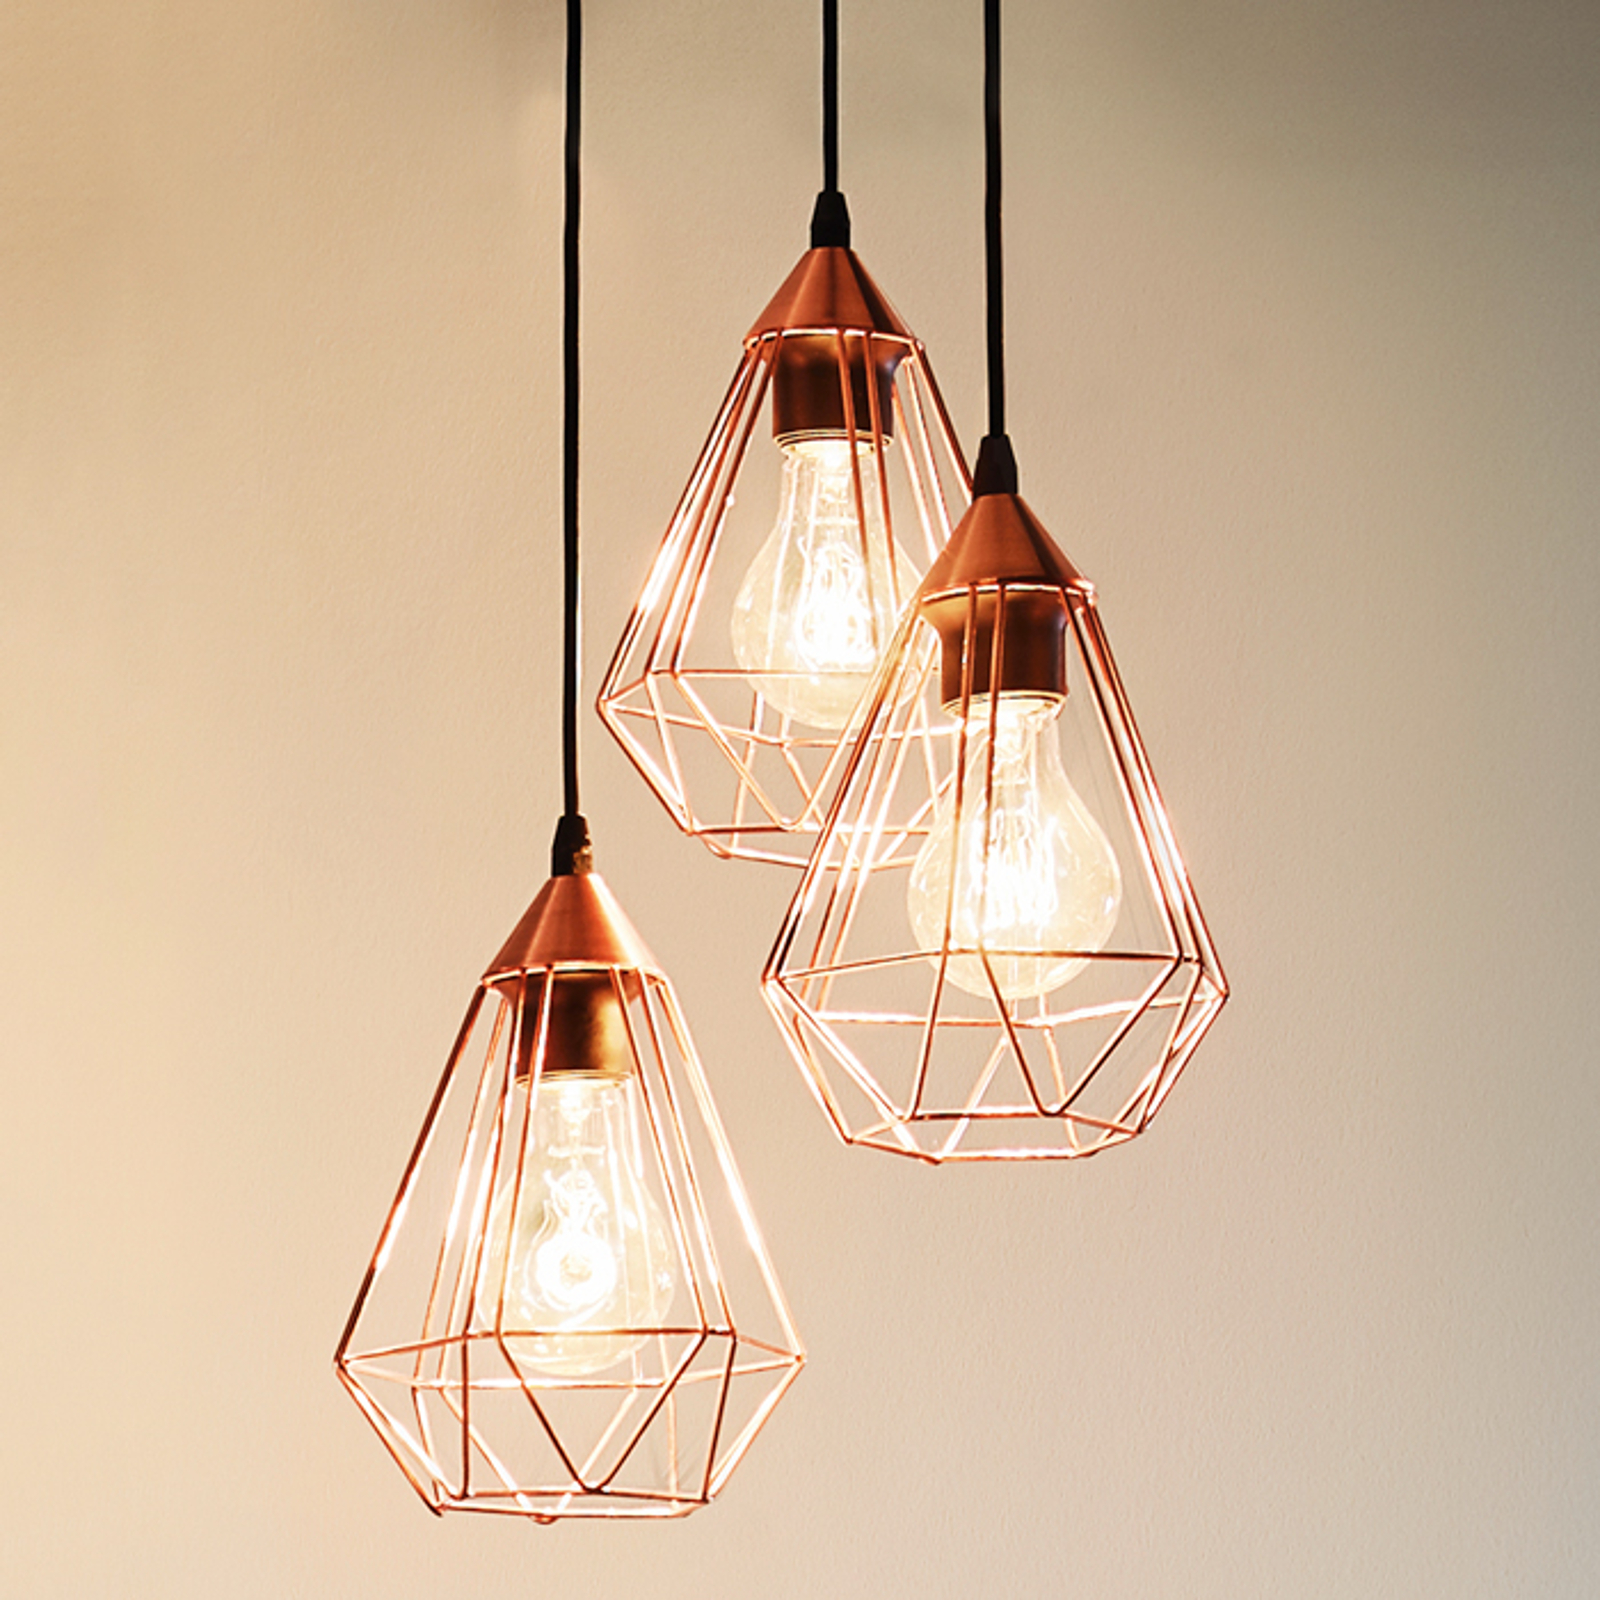 Koper-glanzende hanglamp Tarbes - 3-lichts